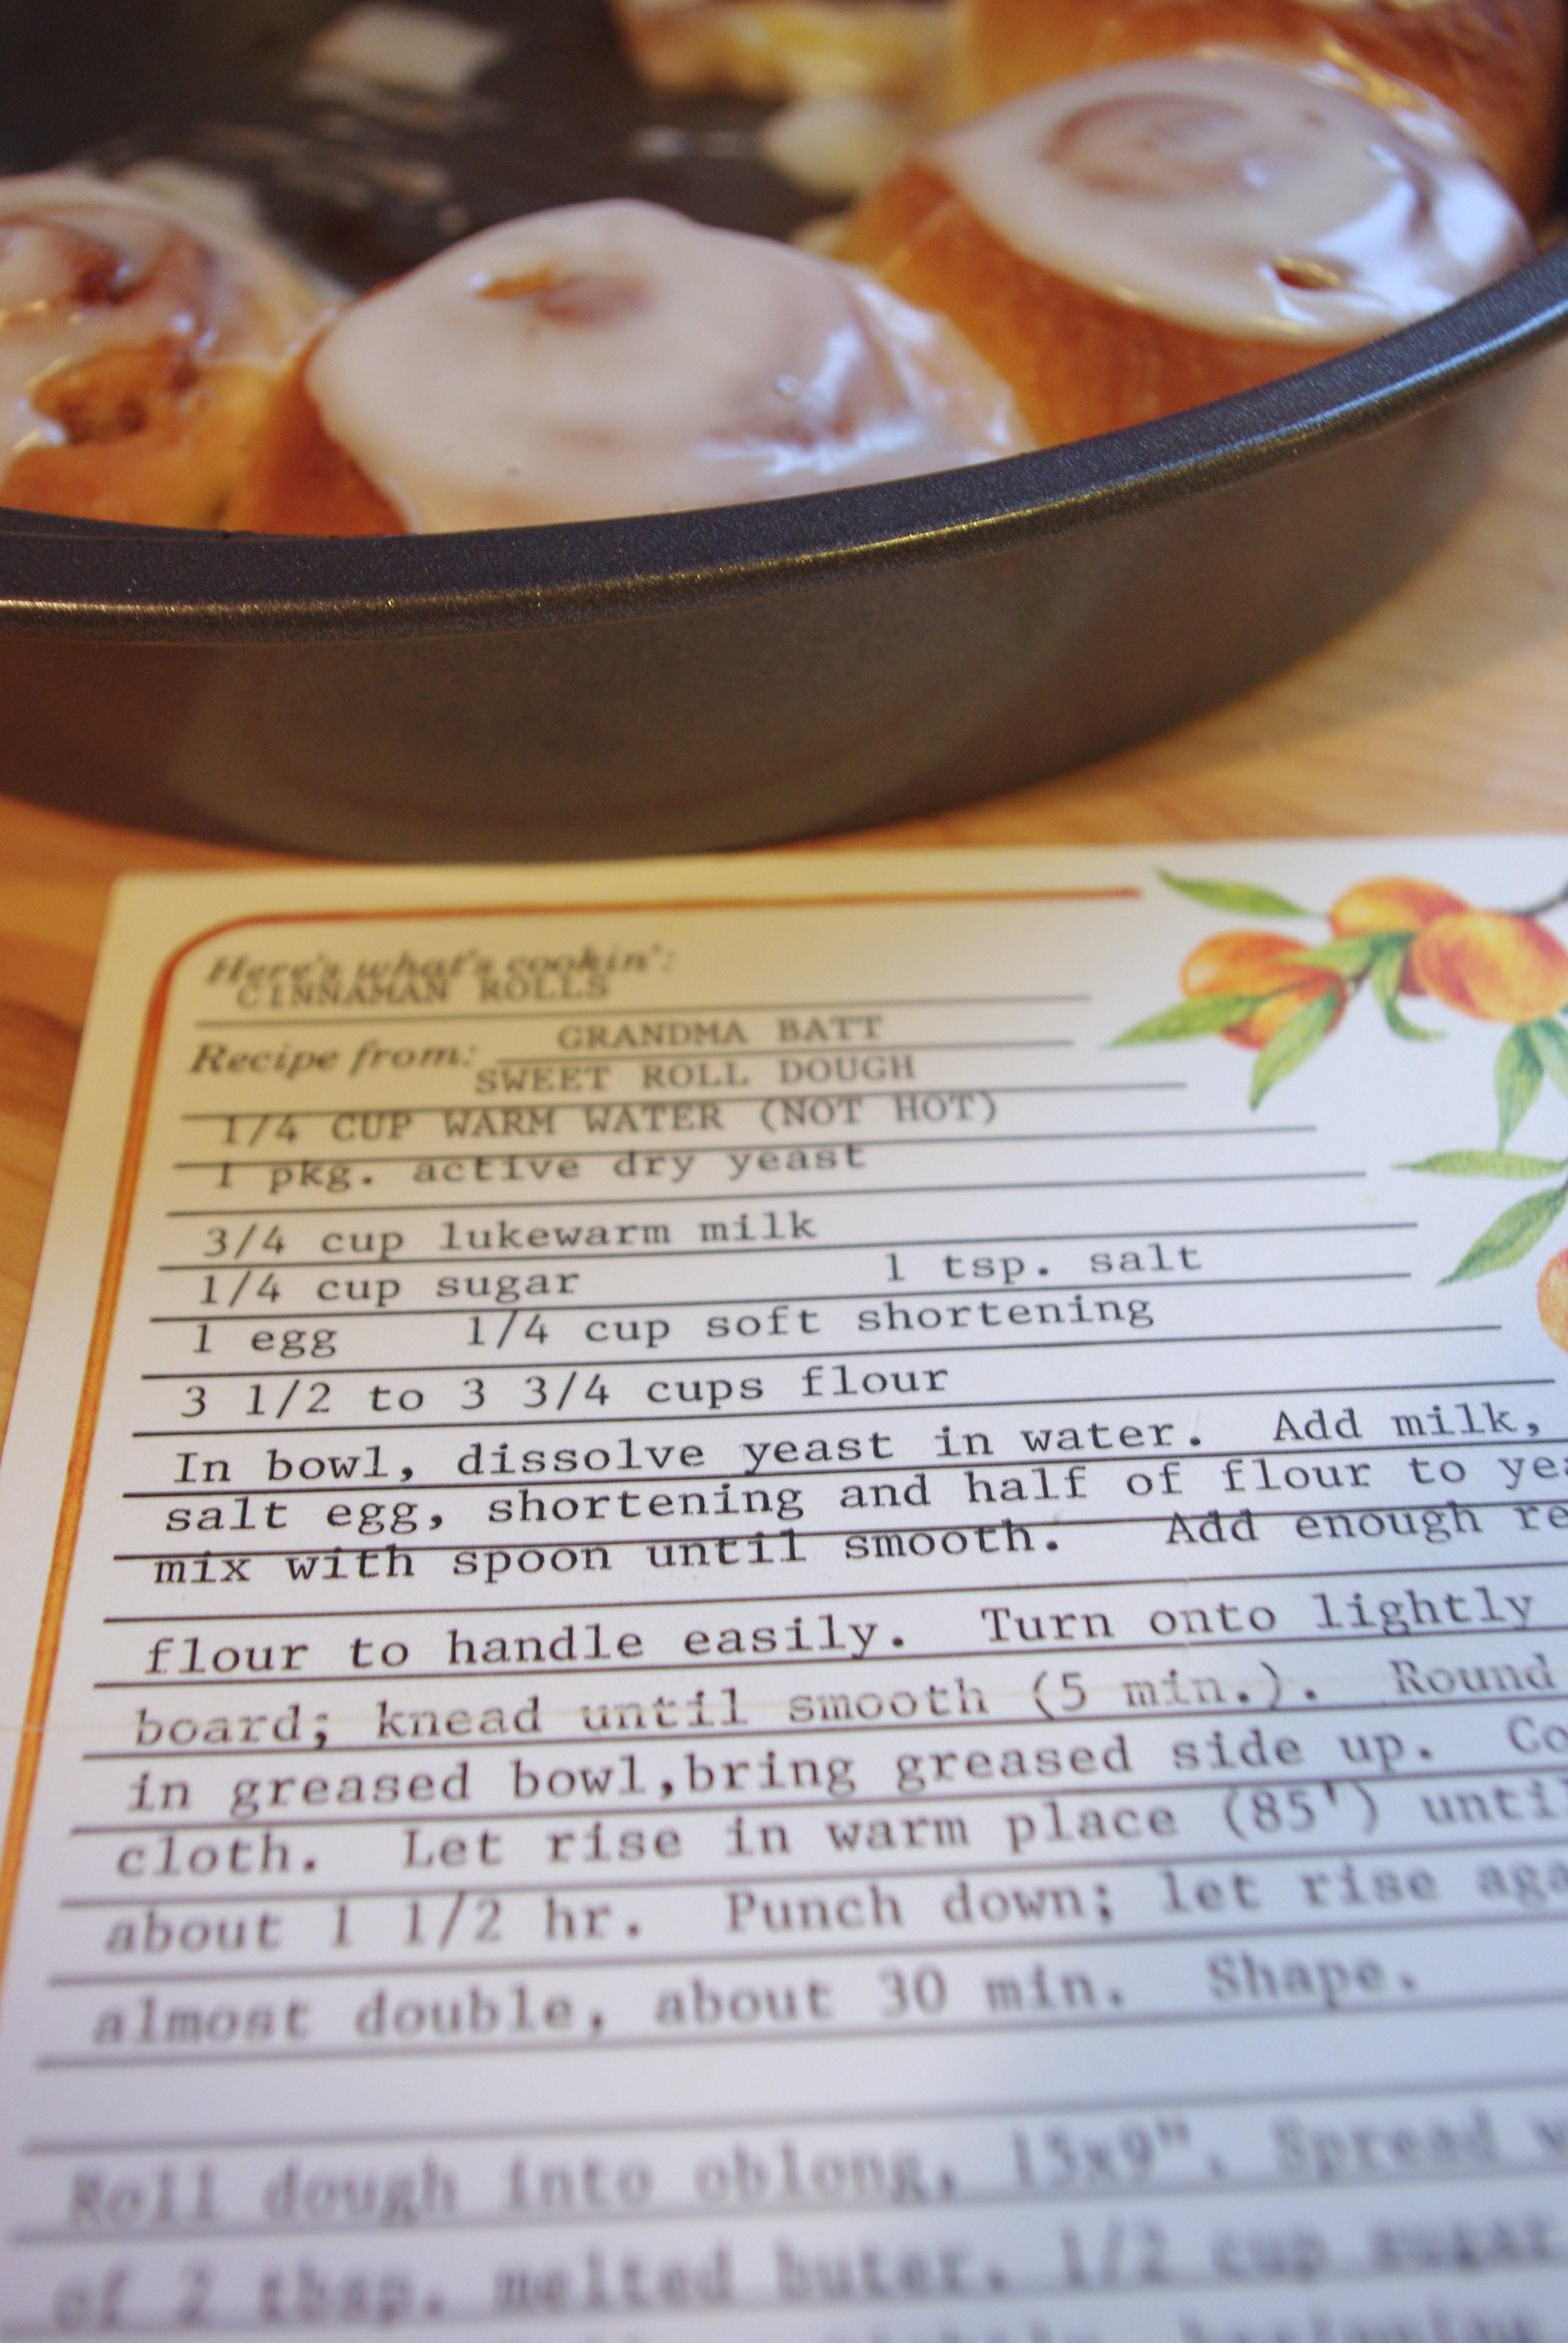 Grandma Batt's Cinnamon Rolls via Ms. Cleaver